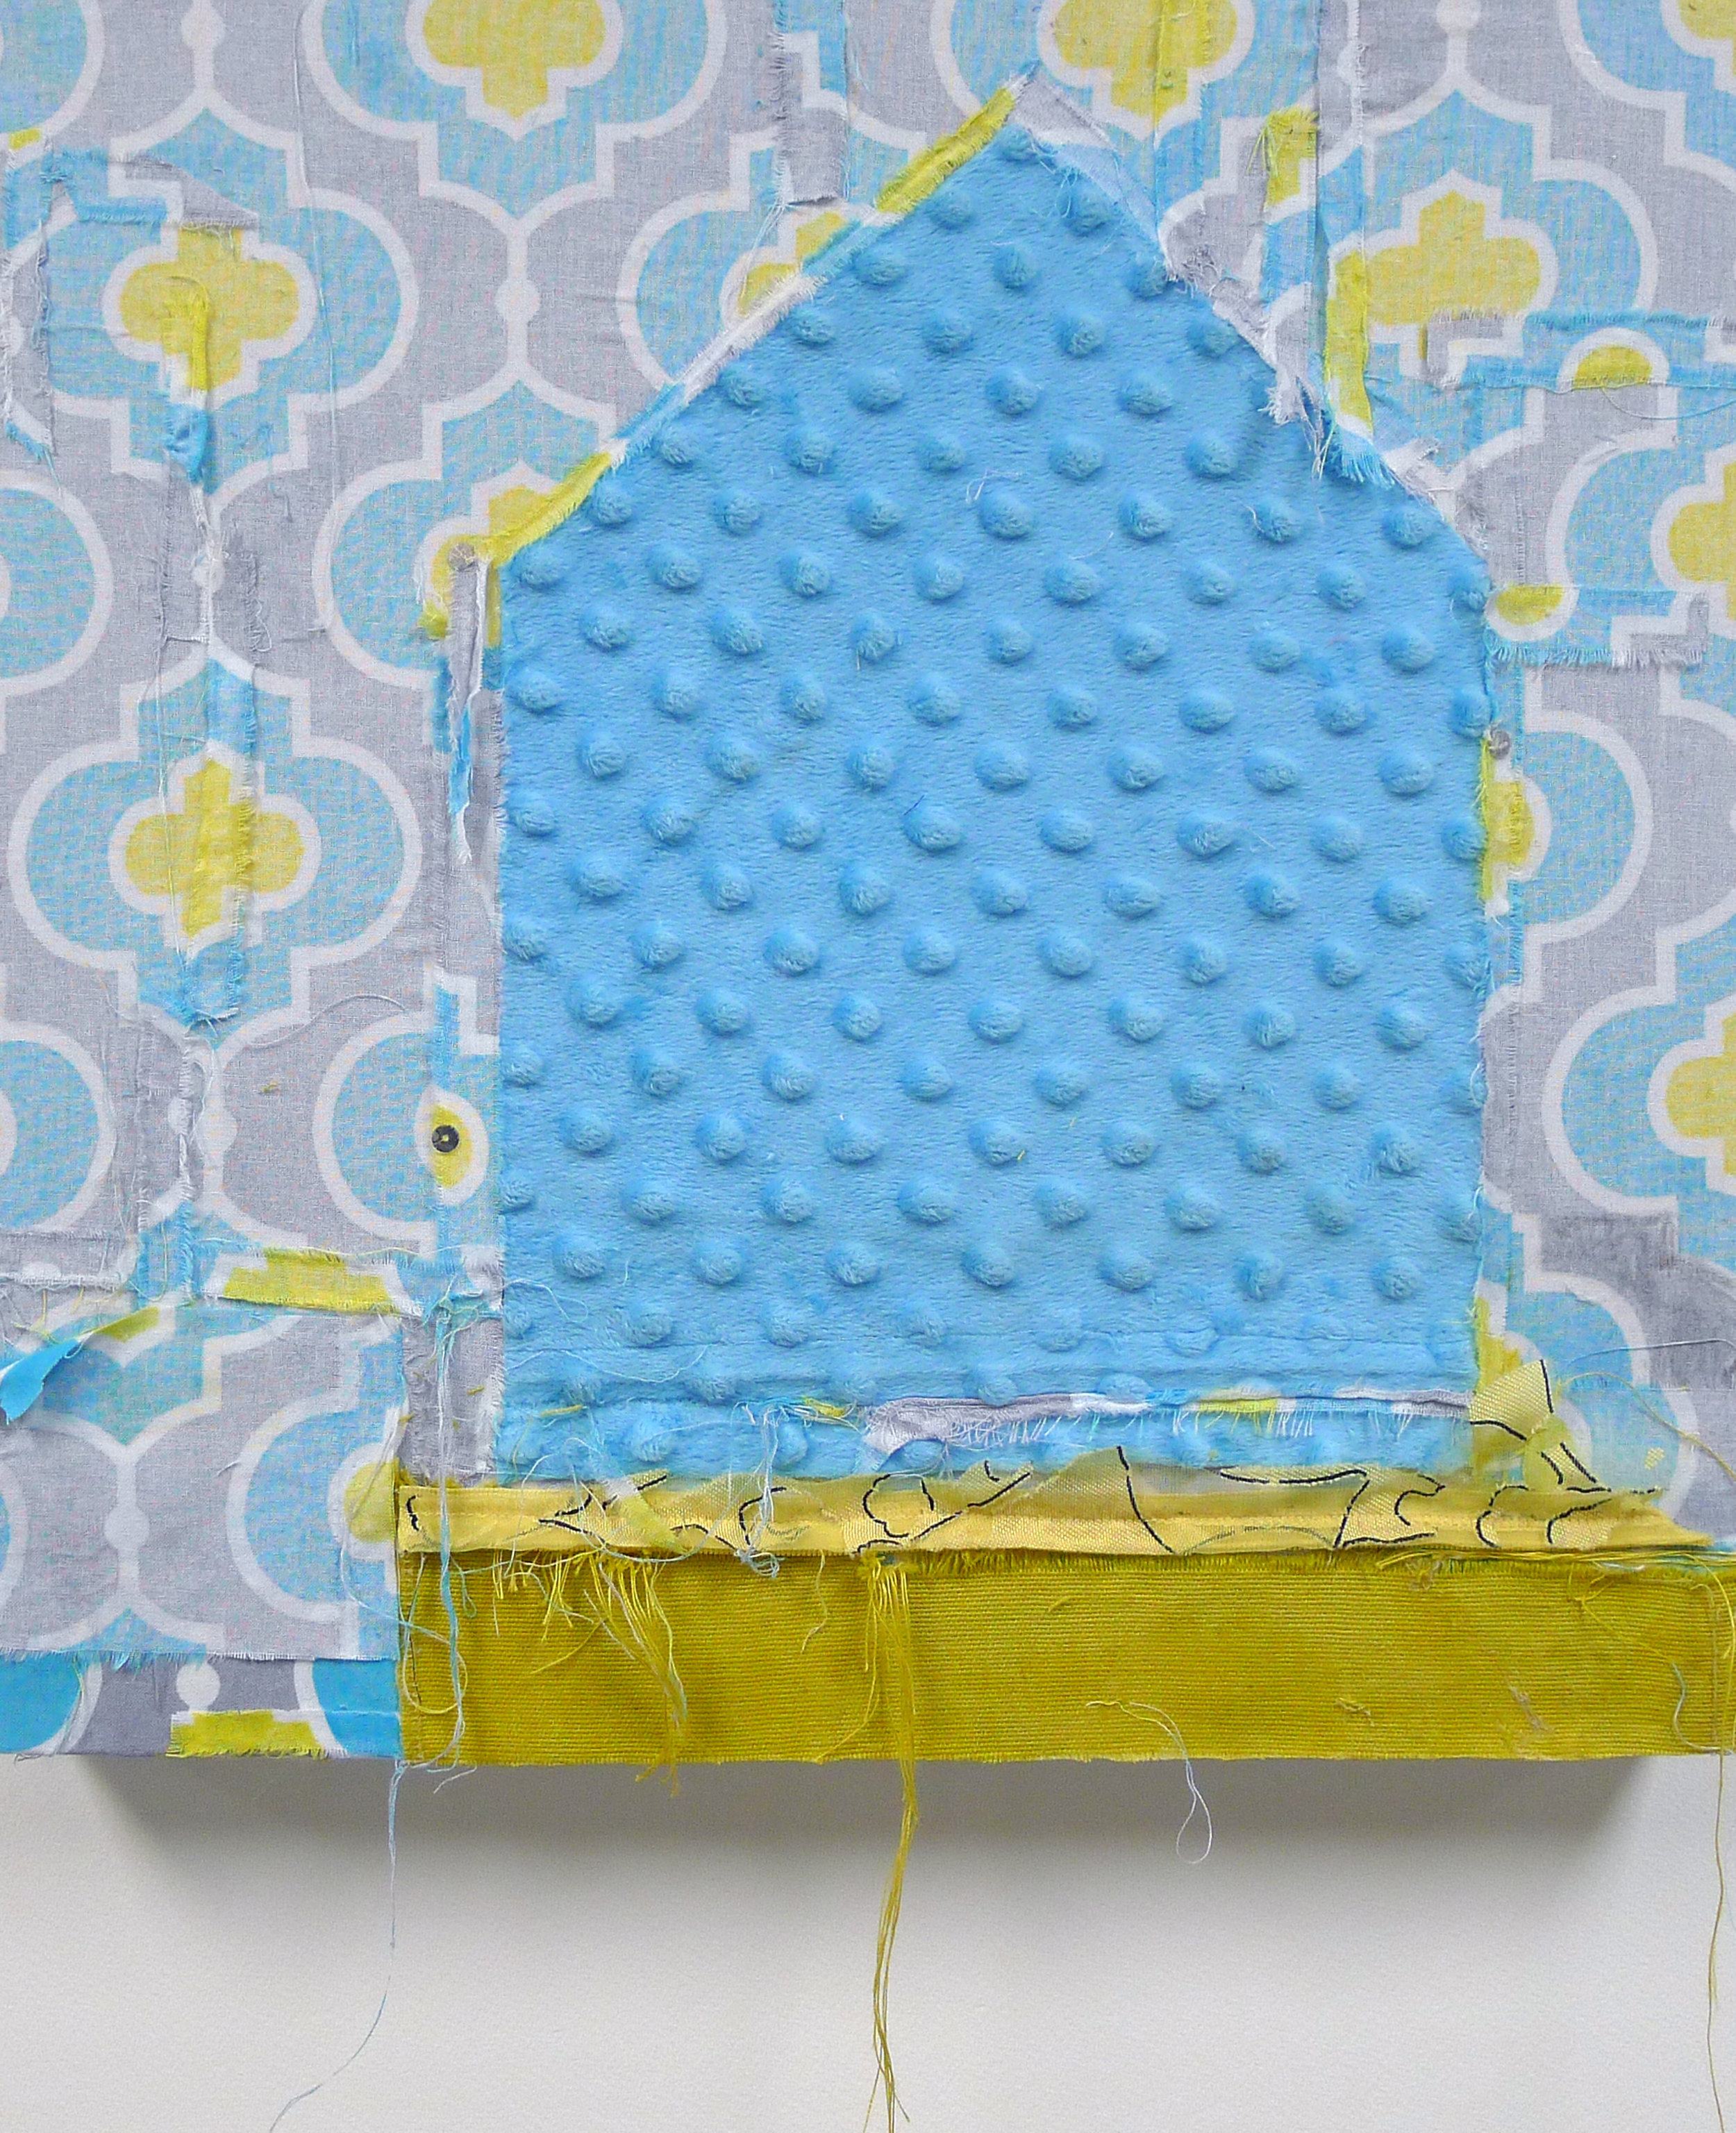 Brenda Cirioni,  Dream House: Appearances,  Fabric and sequins, 16x16